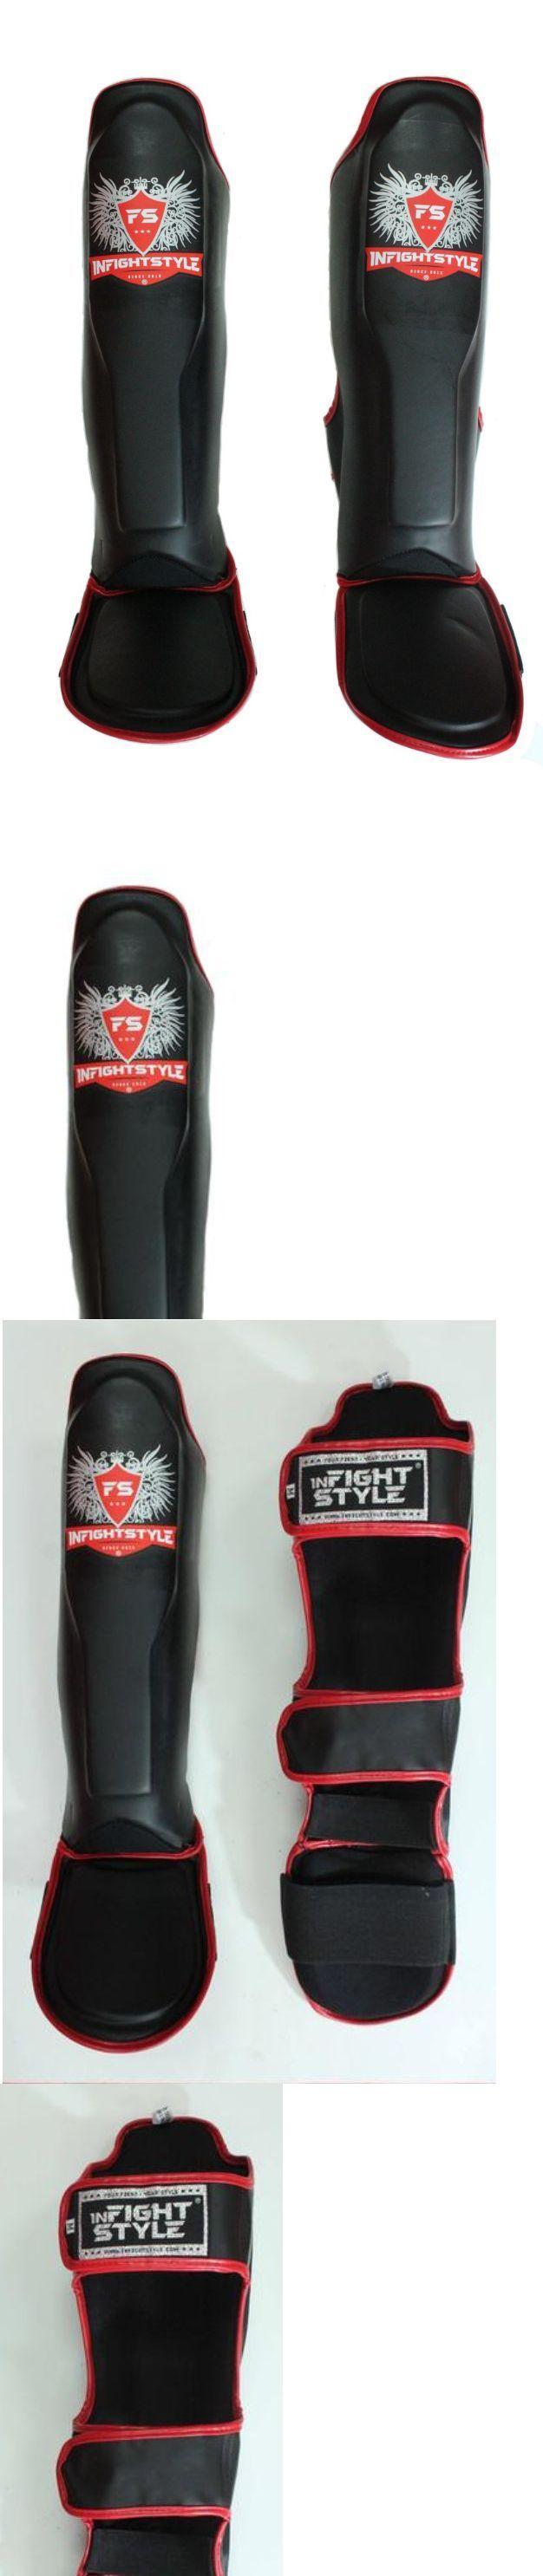 Shin Guards 179782: Infightstyle Muay Thai Boxing Shinguards Shin Kicking Pad Semi-Leather Black Usa -> BUY IT NOW ONLY: $62.99 on eBay!